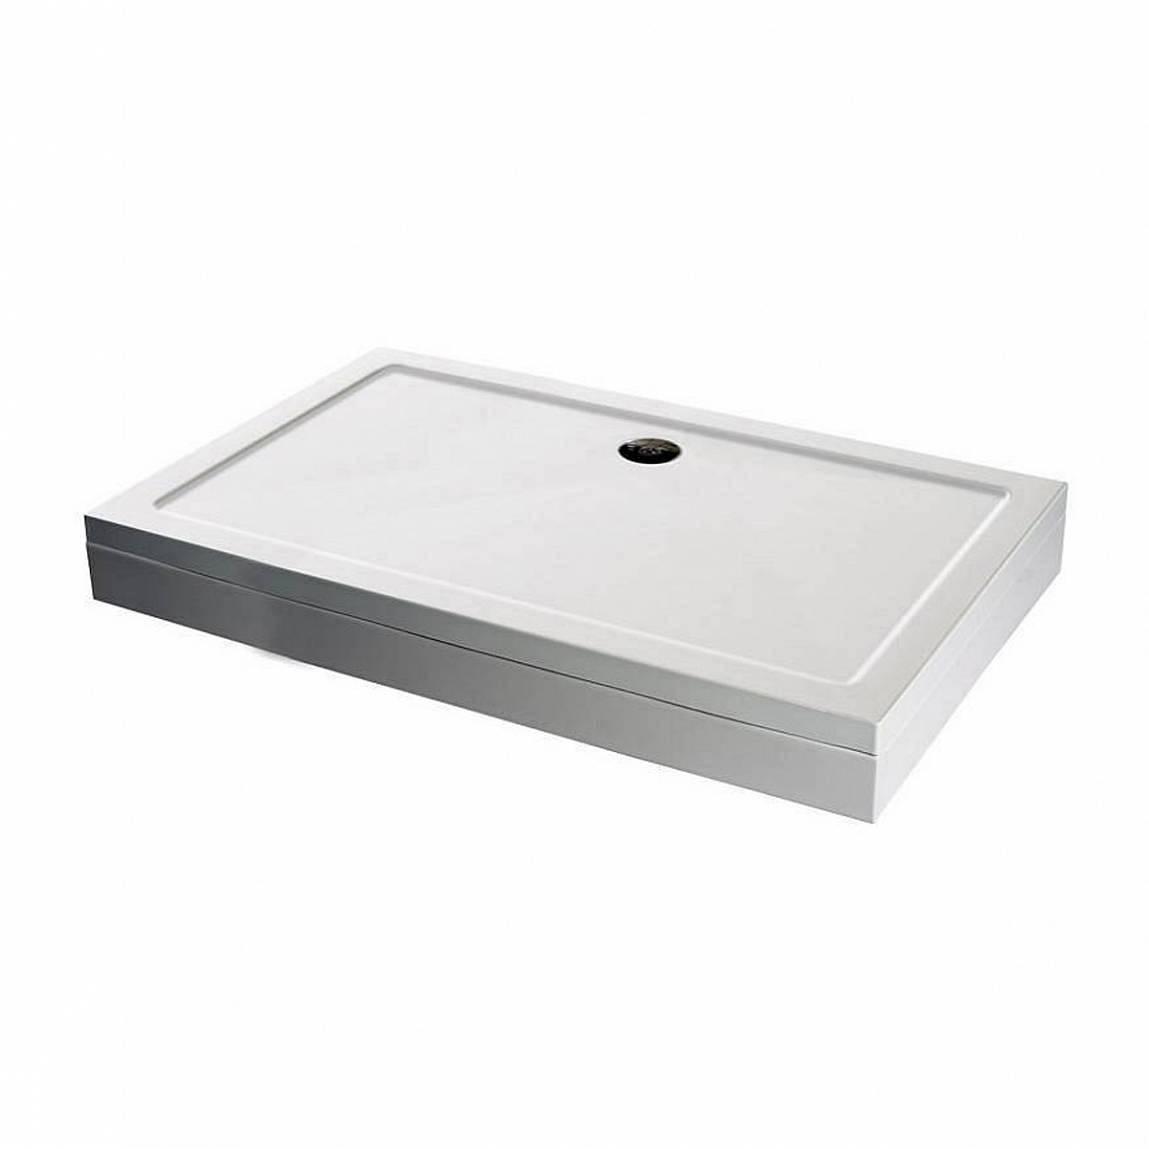 Image of Rectangular Stone Shower Tray & Riser Kit 1100 x 760